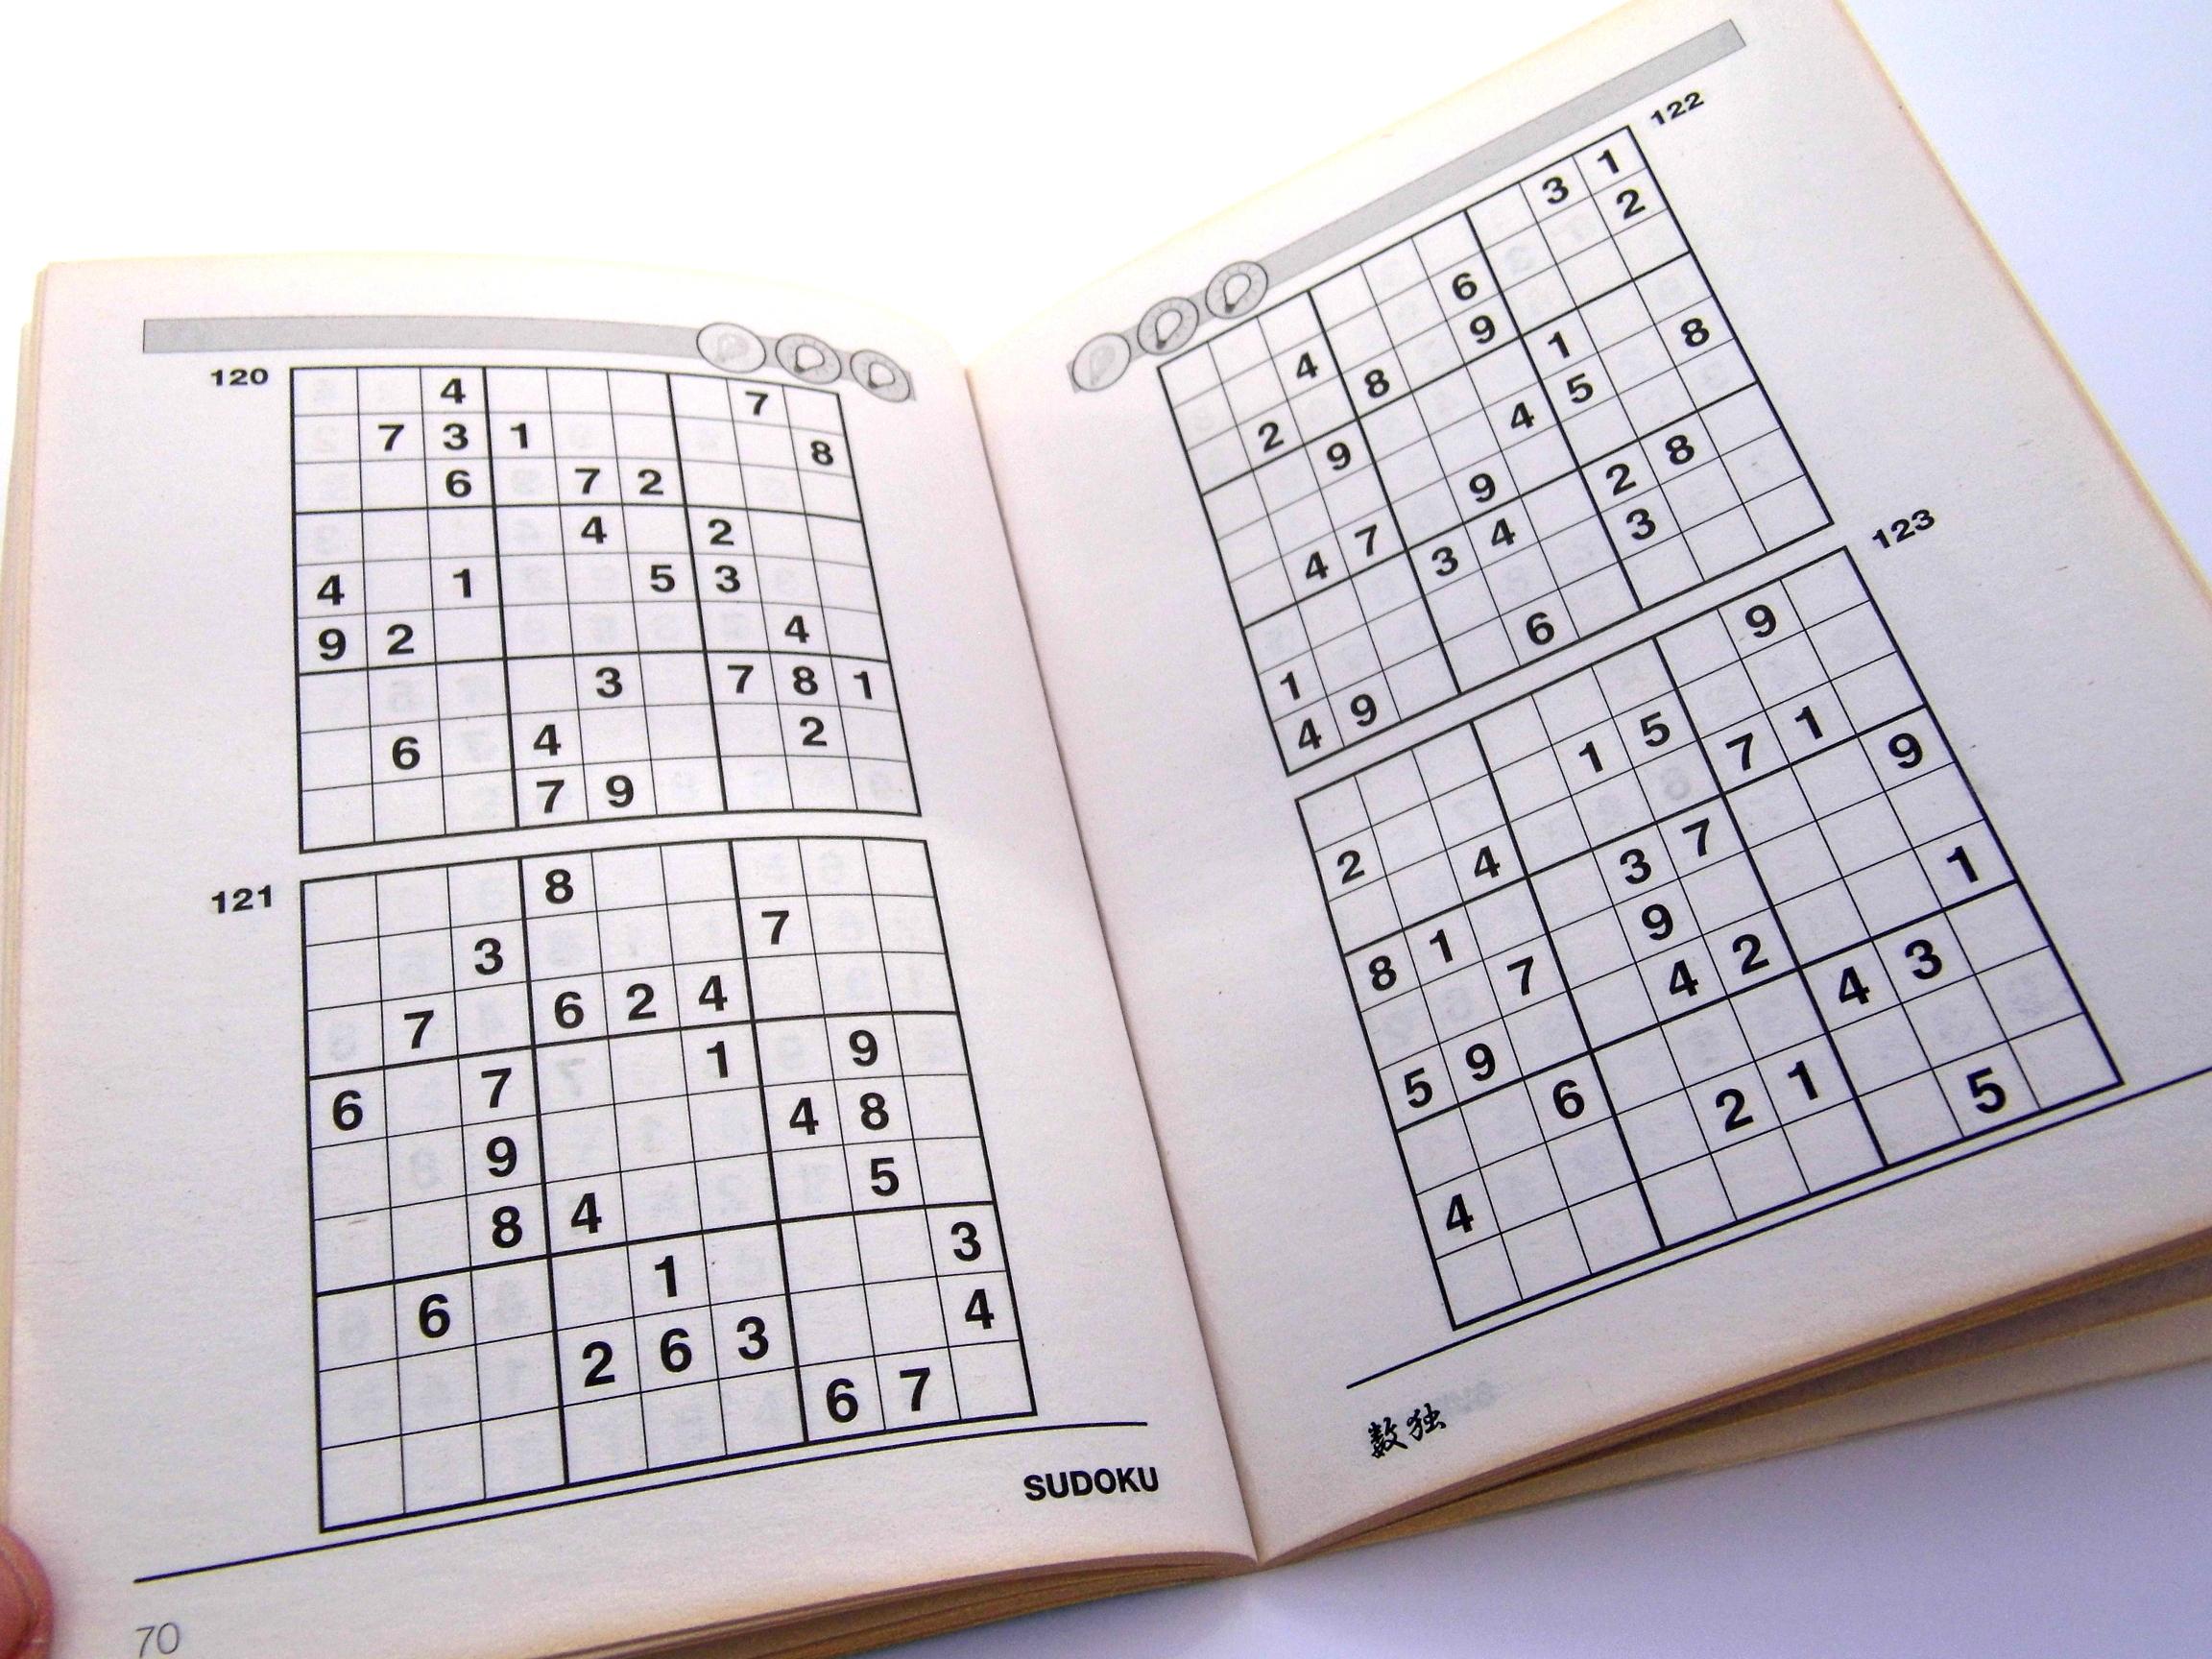 Free Sudoku Puzzles – Free Sudoku Puzzles From Easy To Evil Level - Printable Puzzles.com